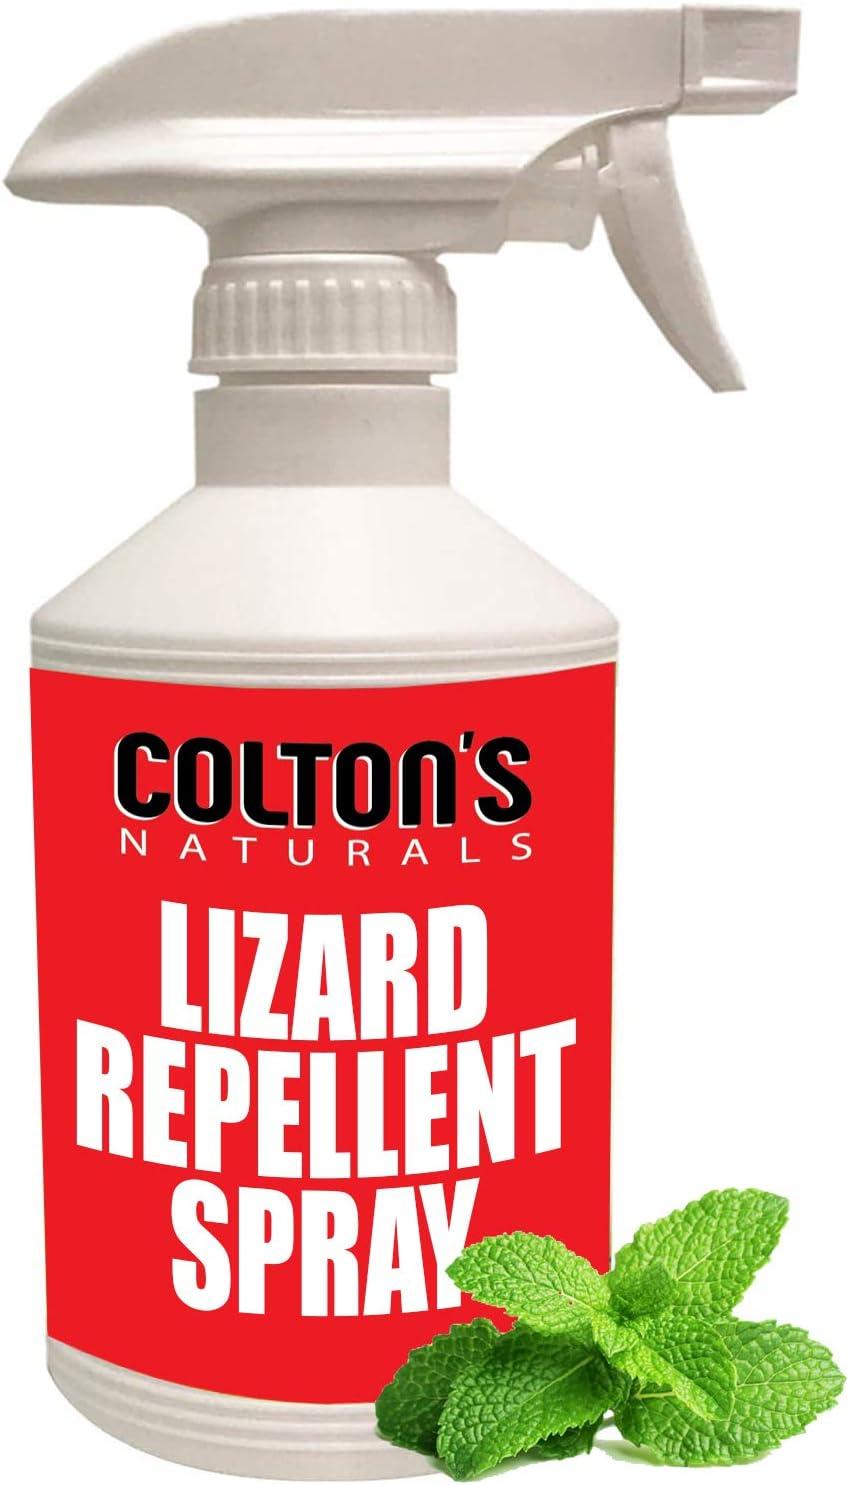 Lizard Repellent 32 OZ Spray Max 77% OFF Natural Gecko Complete Free Shipping Reptile 100% Deterren